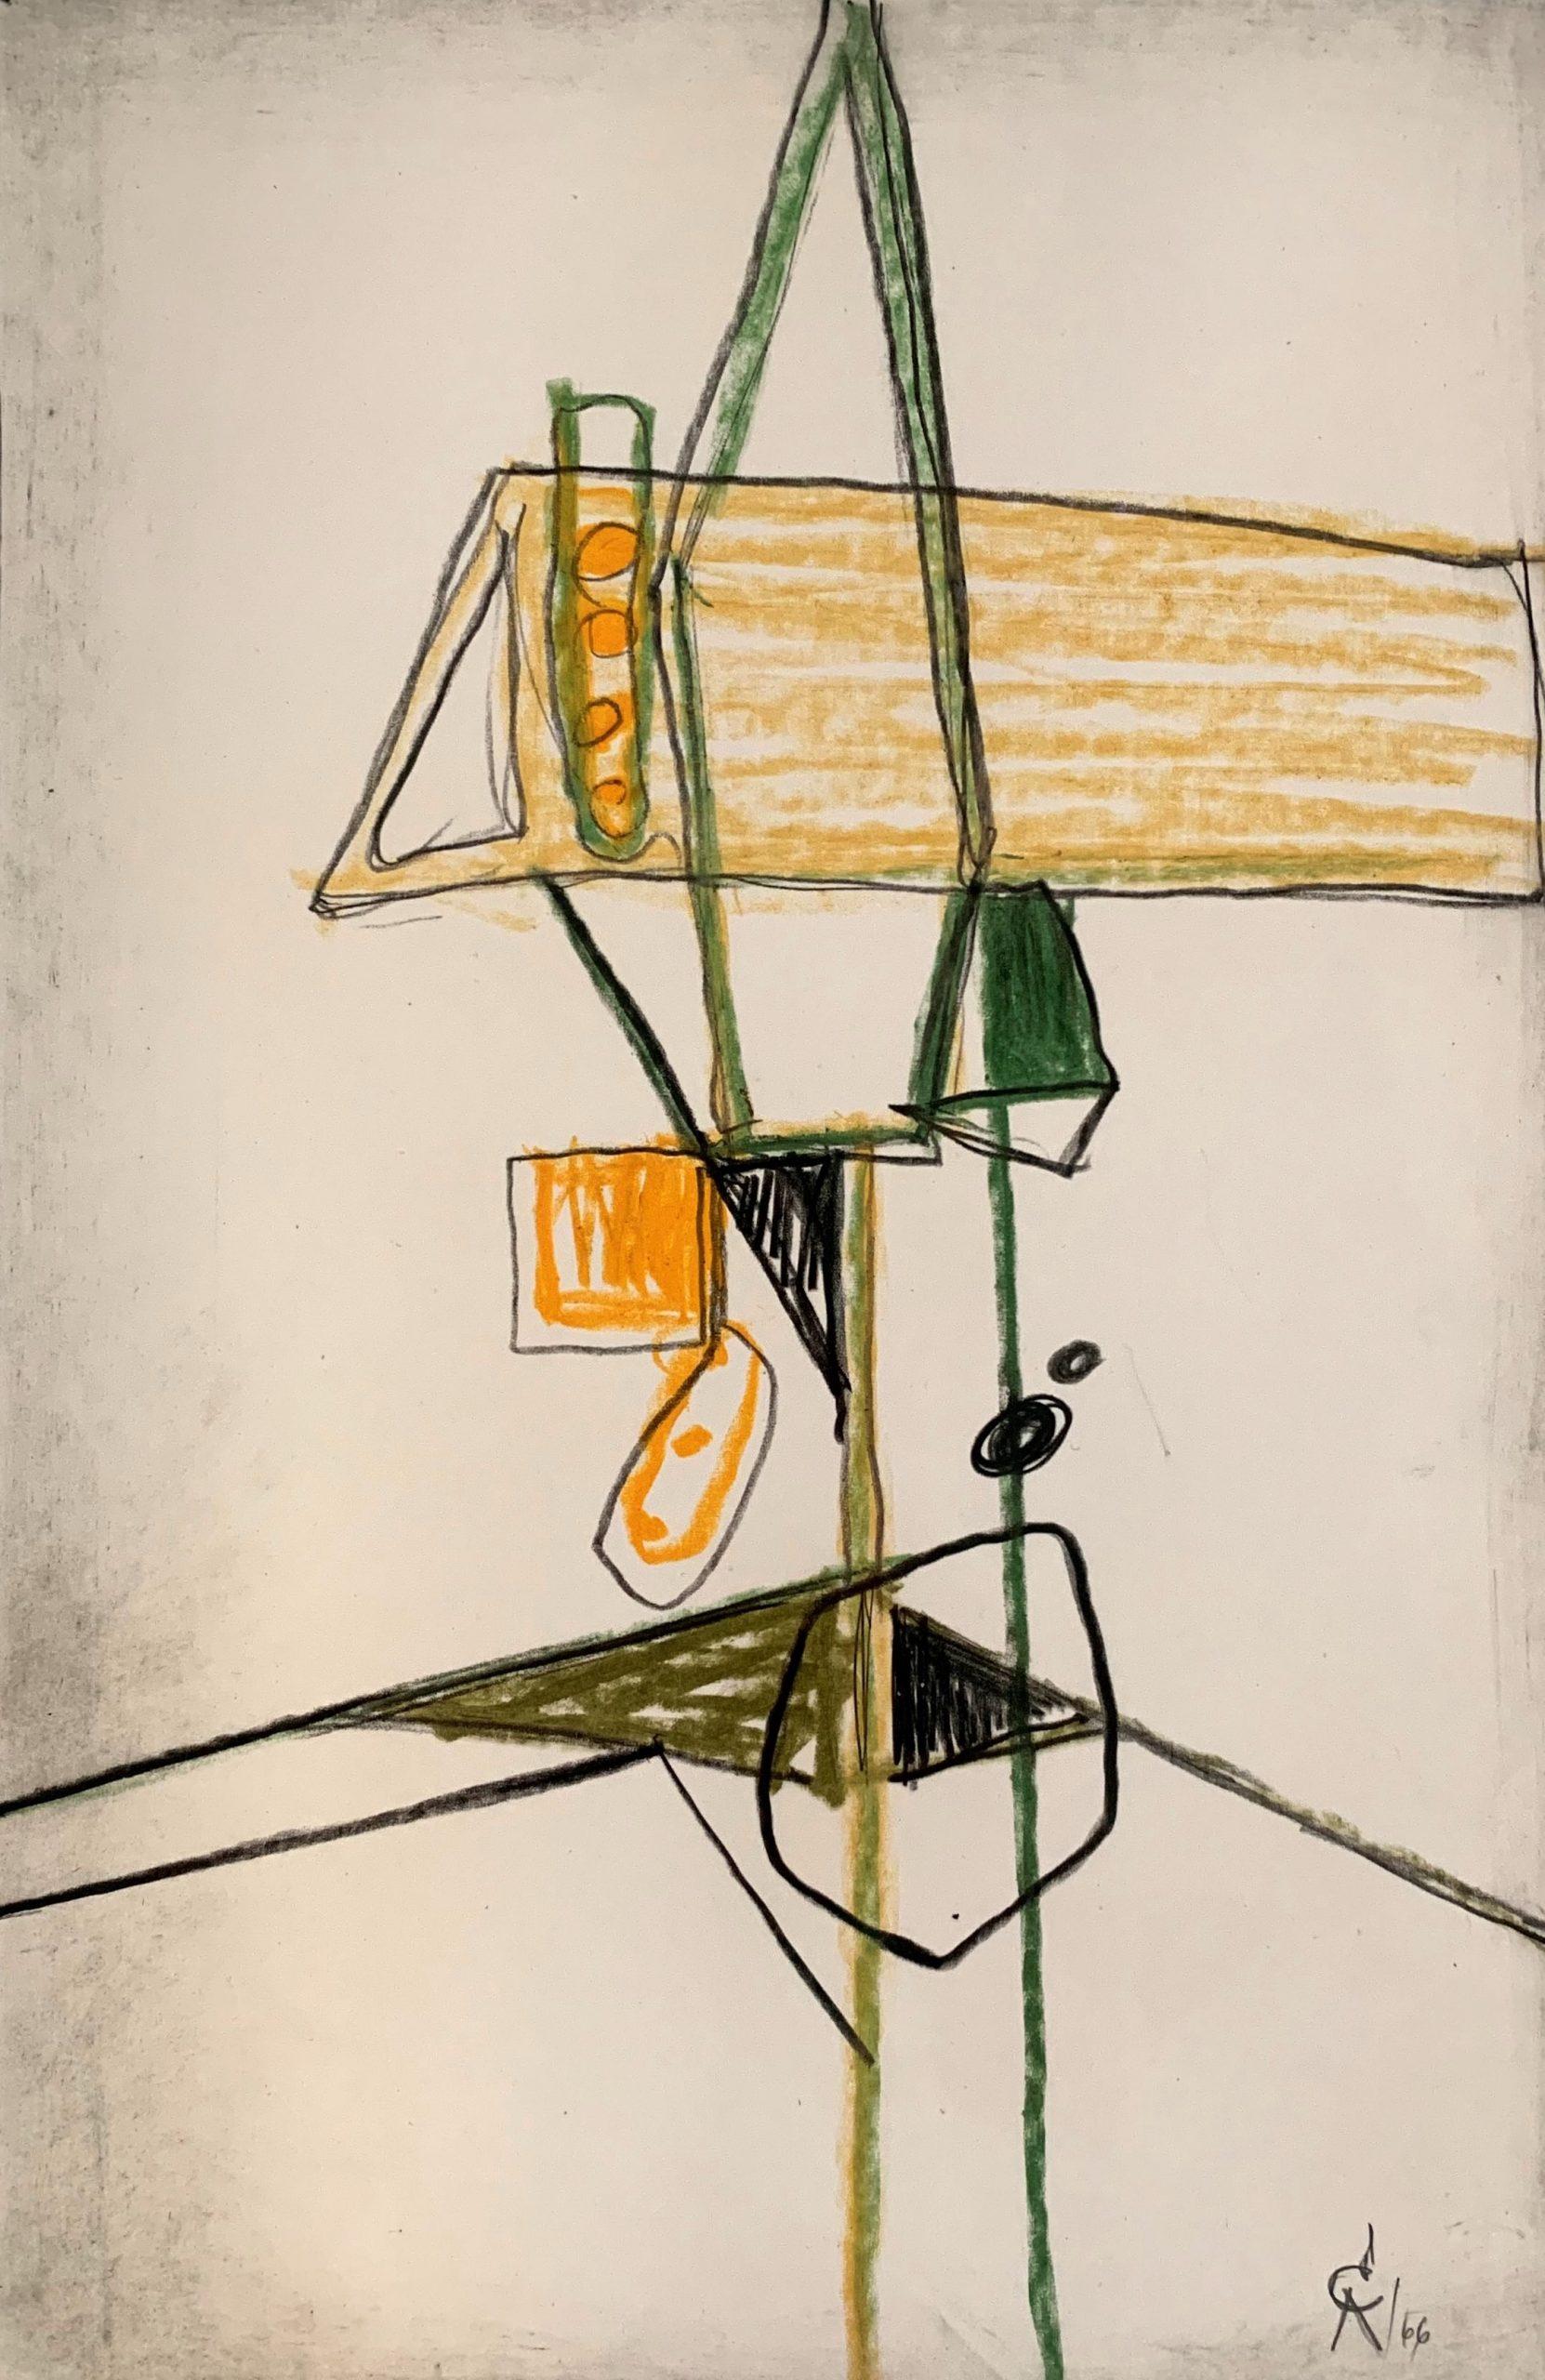 Galerie Maulberger Rolf Cavael (1966)